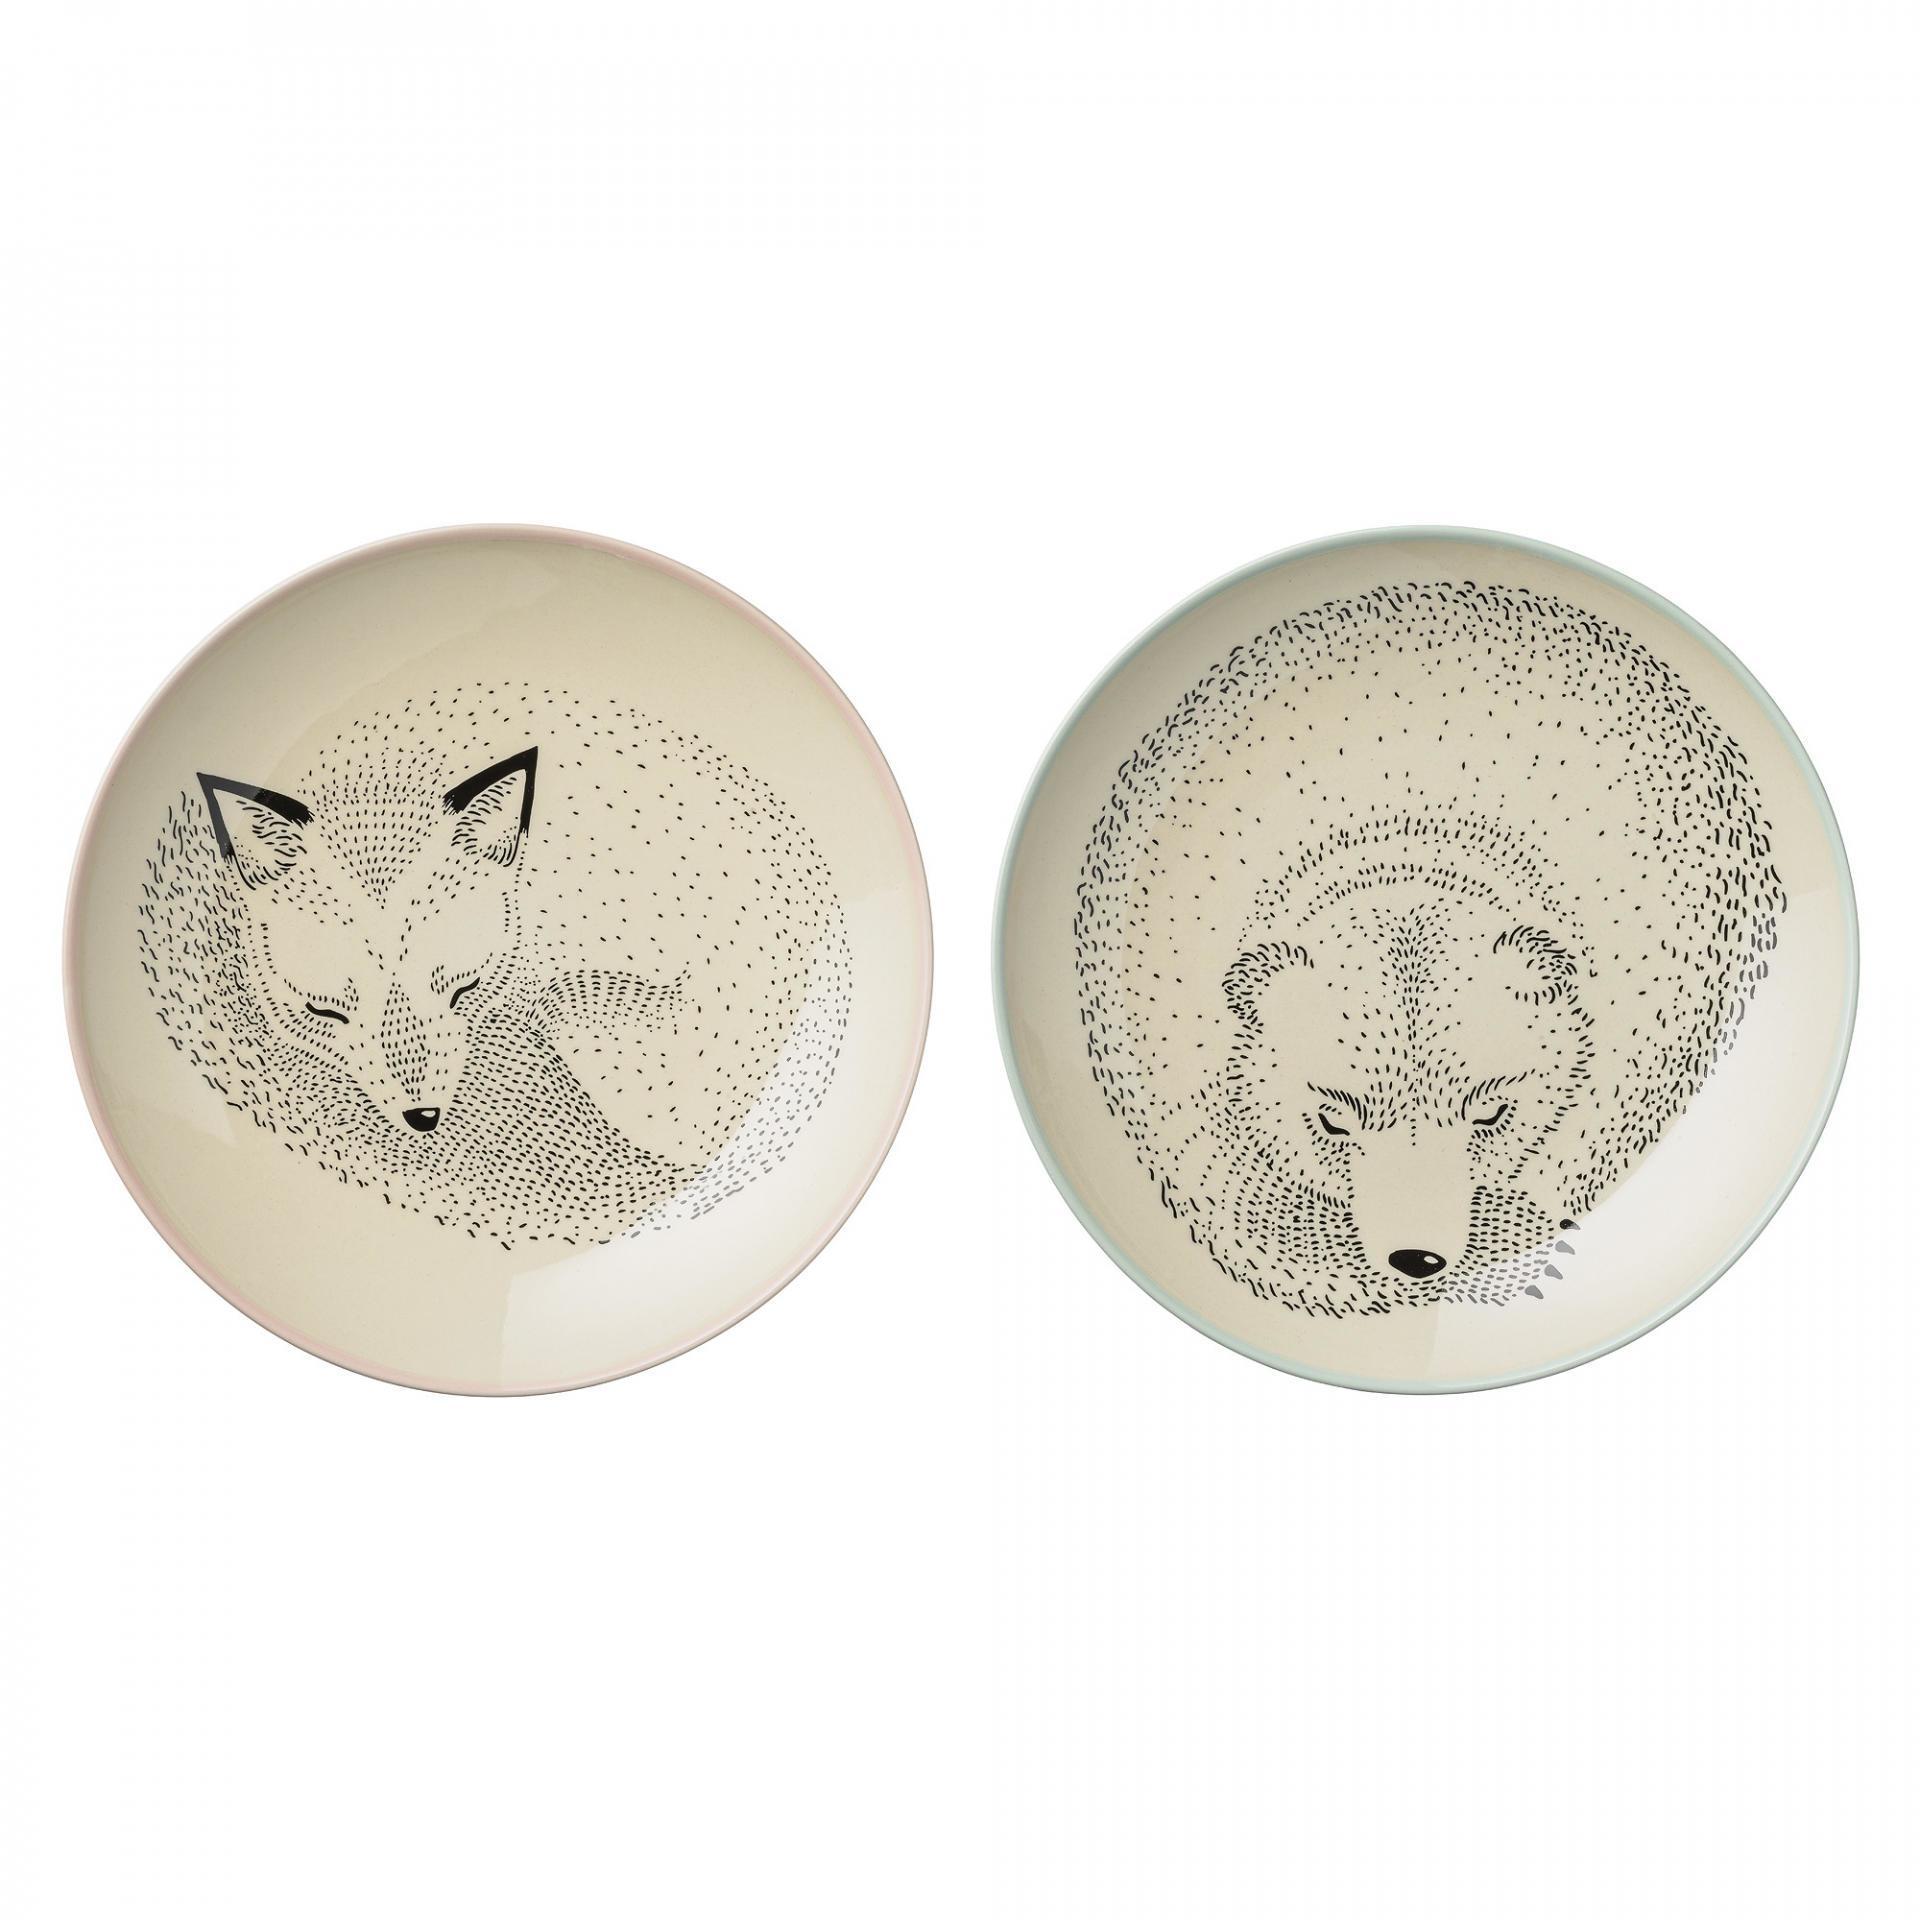 Bloomingville Keramický talíř Adelynn Animals - 2 druhy Medvěd, béžová barva, multi barva, ke